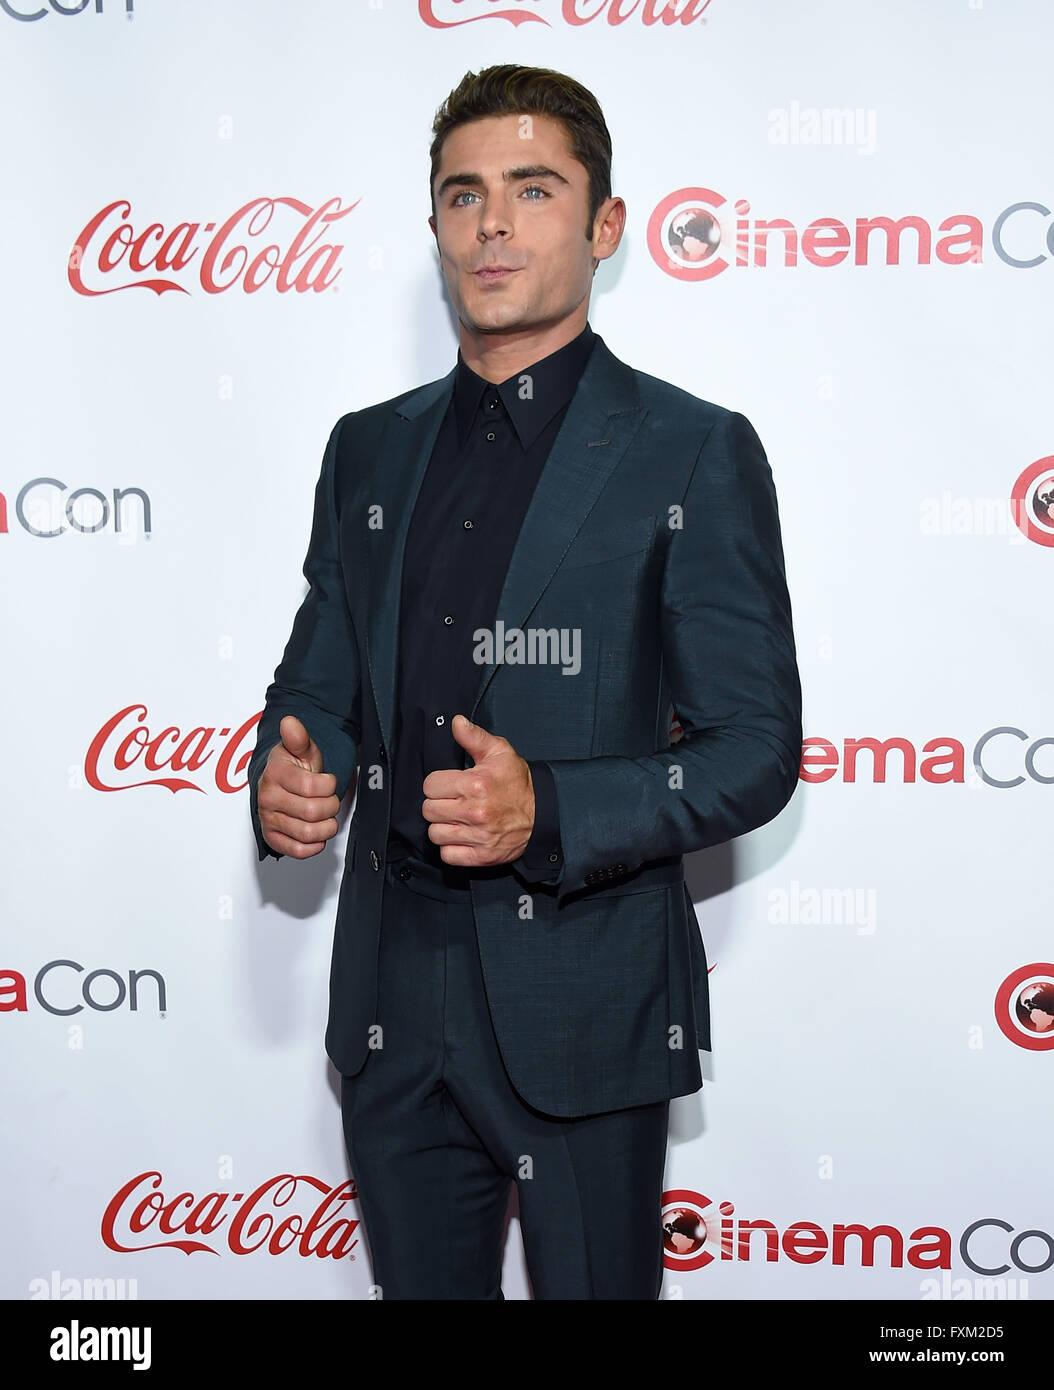 Las Vegas, Nevada, USA. 14th Apr, 2016. Zac Efron arrives for the Cinema Con 2016: Awards Gala at Caeser's Palace. Stock Photo